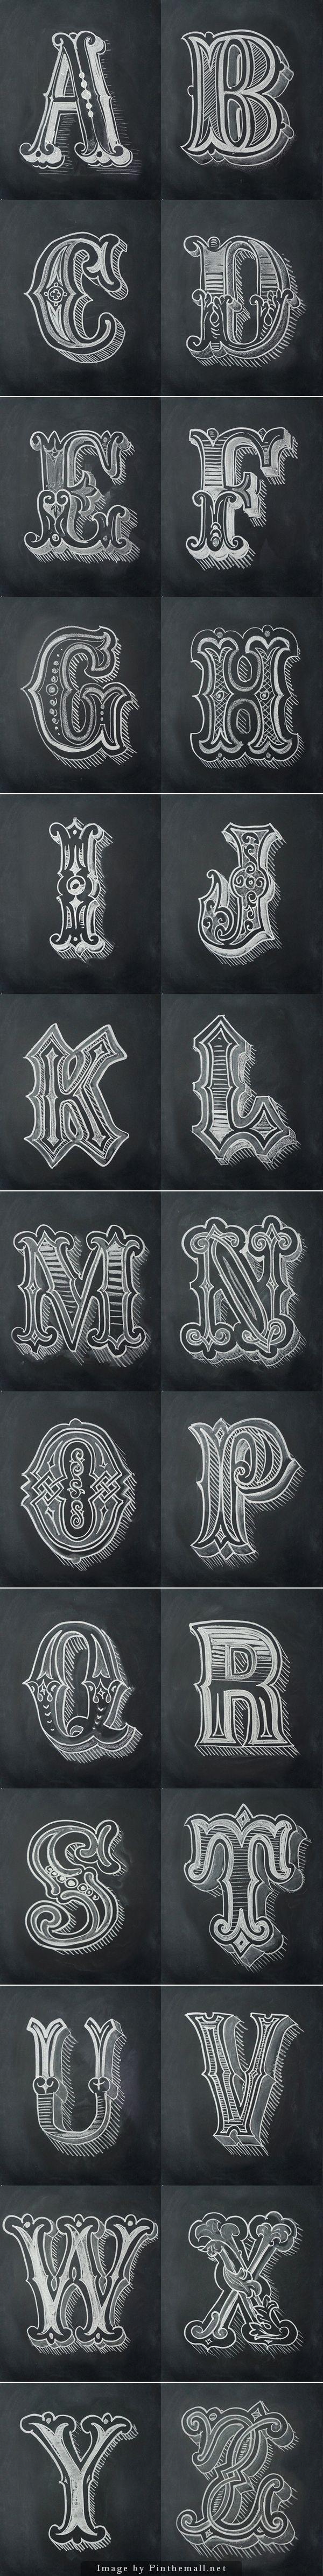 capitulares adornadas; formas e estilos diferentes na mesma letra; formas arredondadas e relacionadas a vegtais